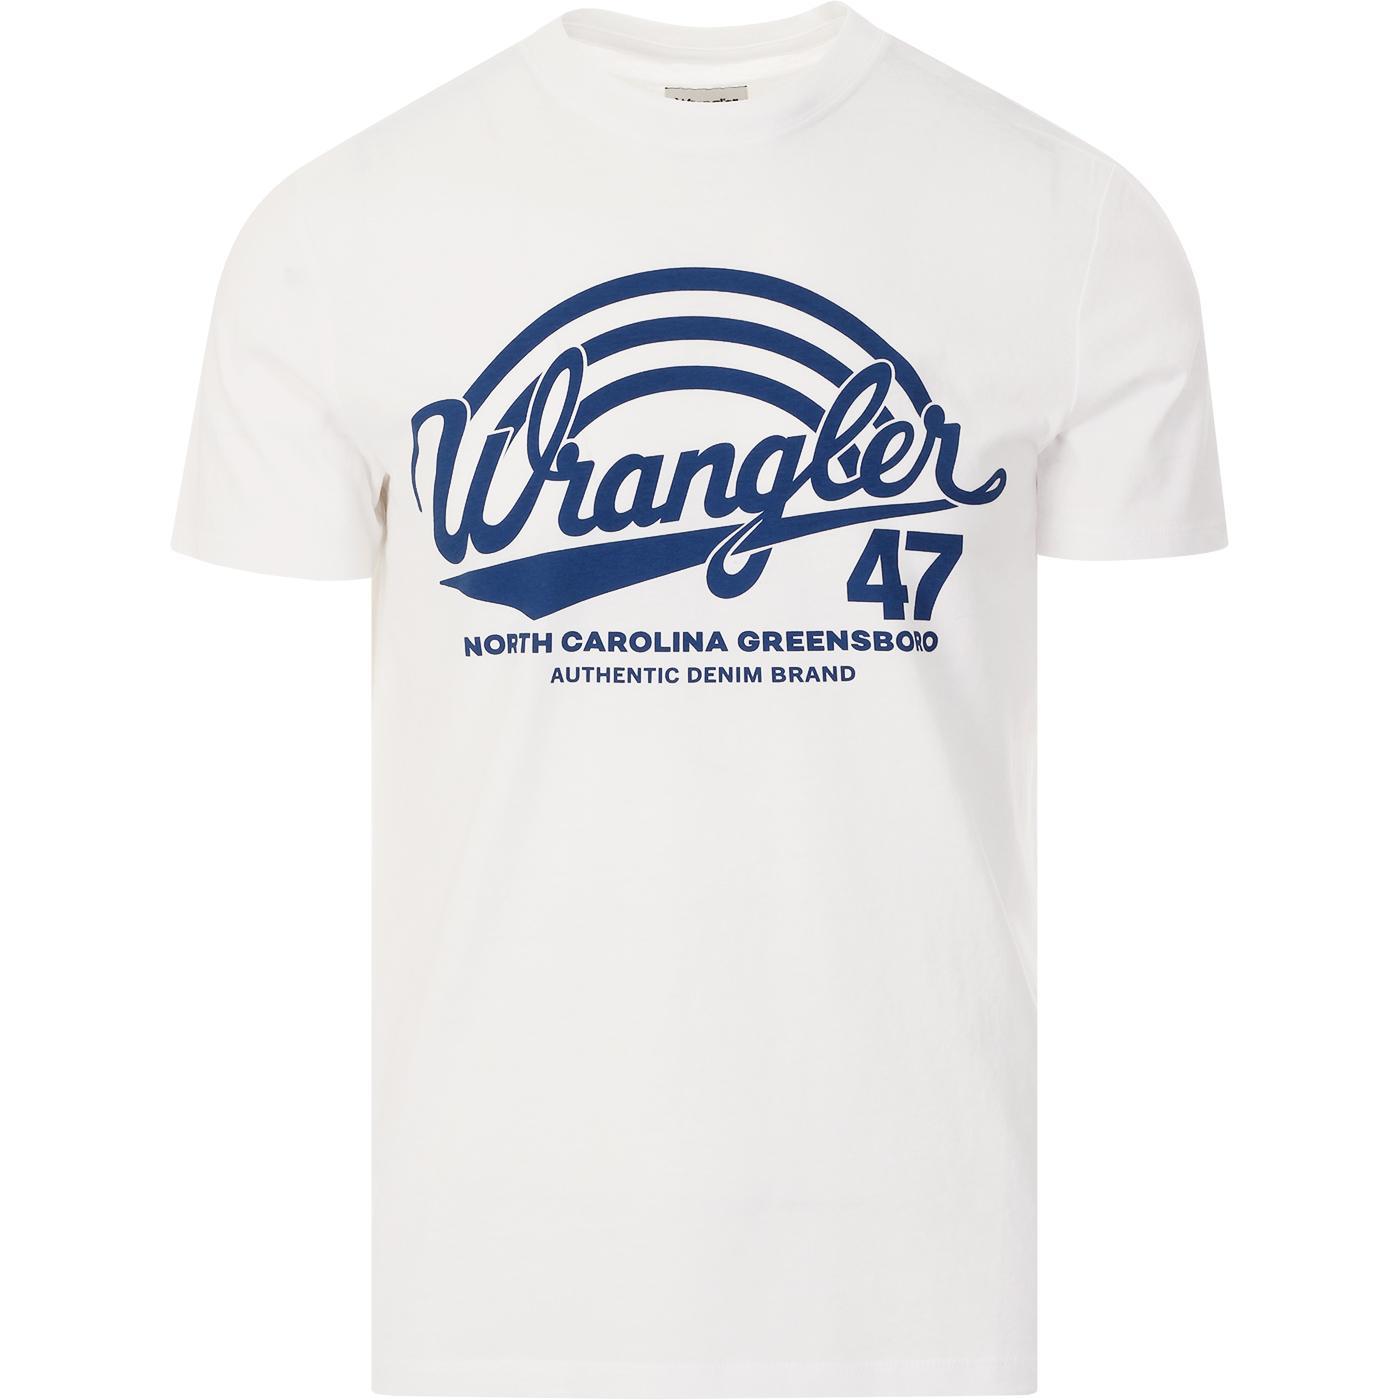 WRANGLER Americana Men's Retro 70s Tee (White)